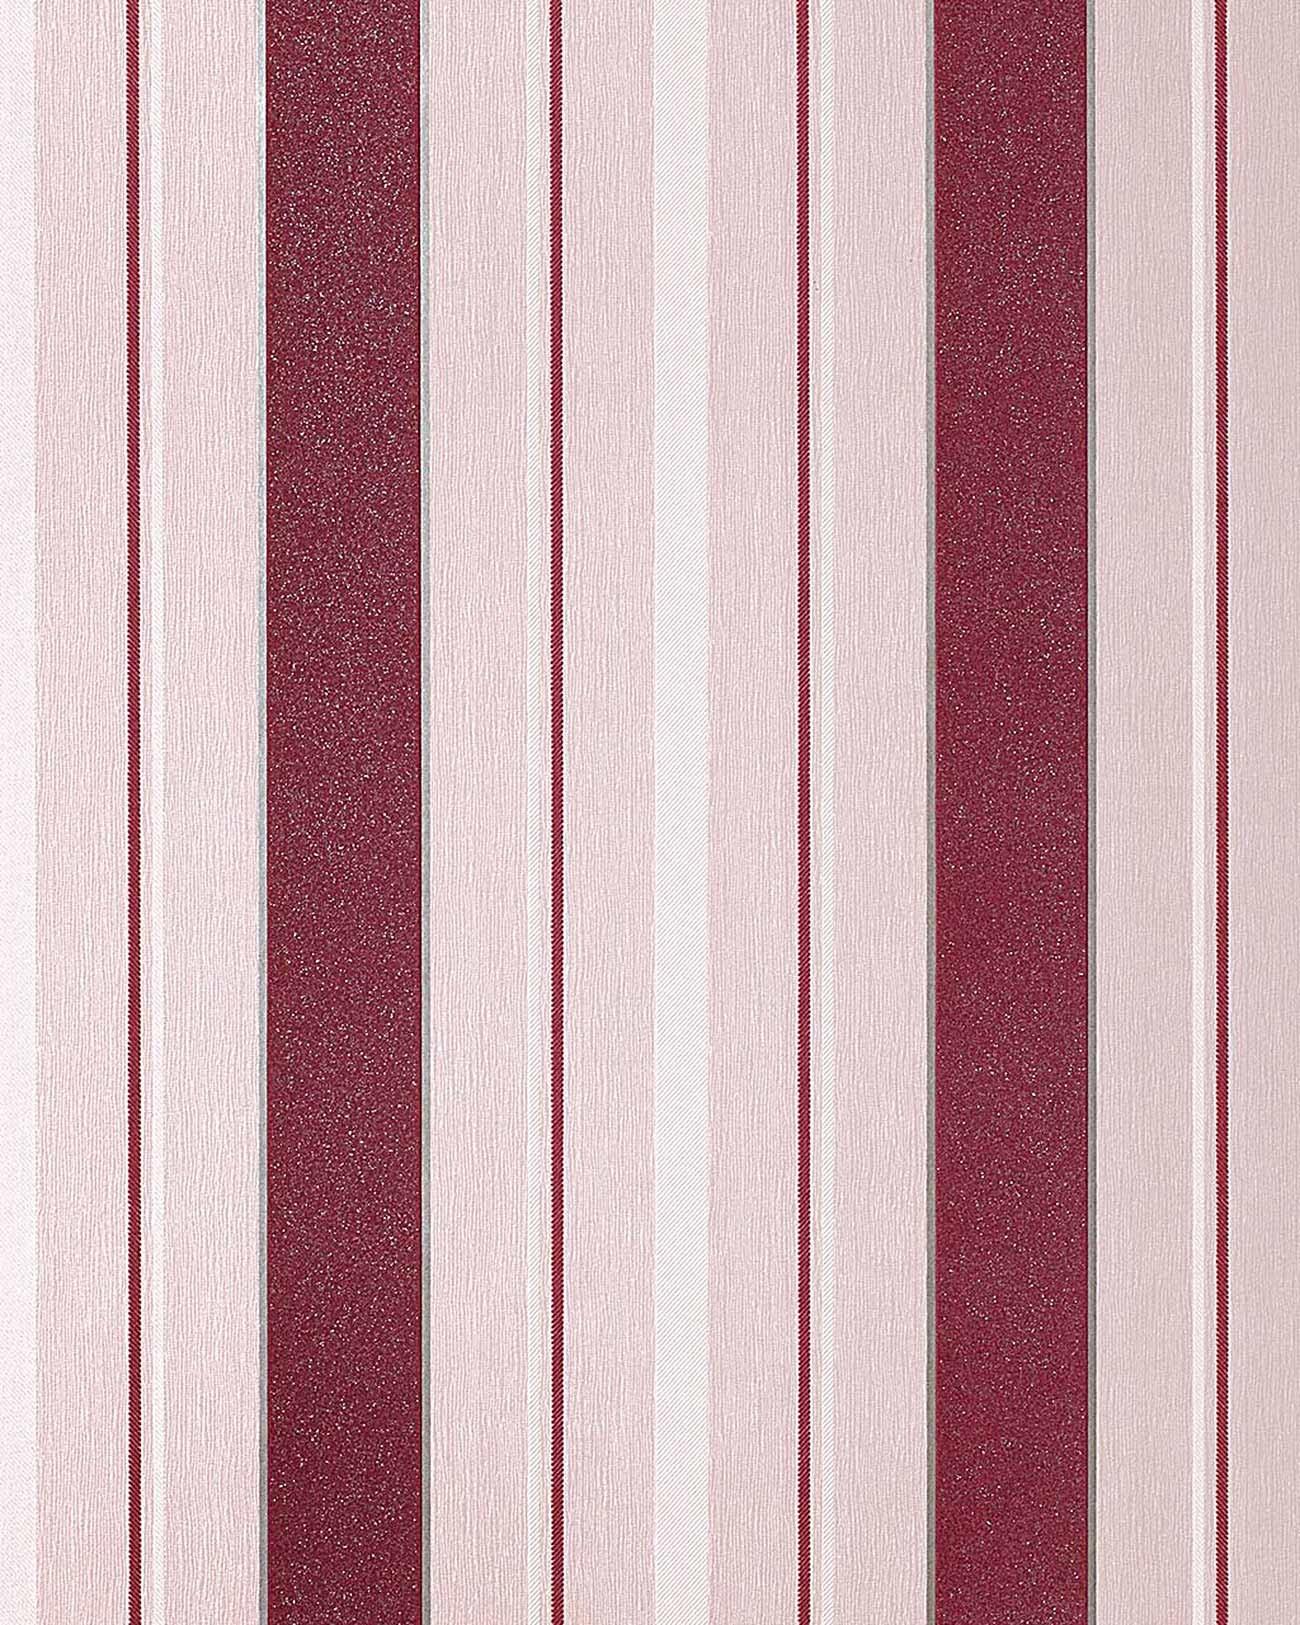 Edem 069 24 carta da parati a righe con disegno a strisce for Carta da parati adesiva a righe